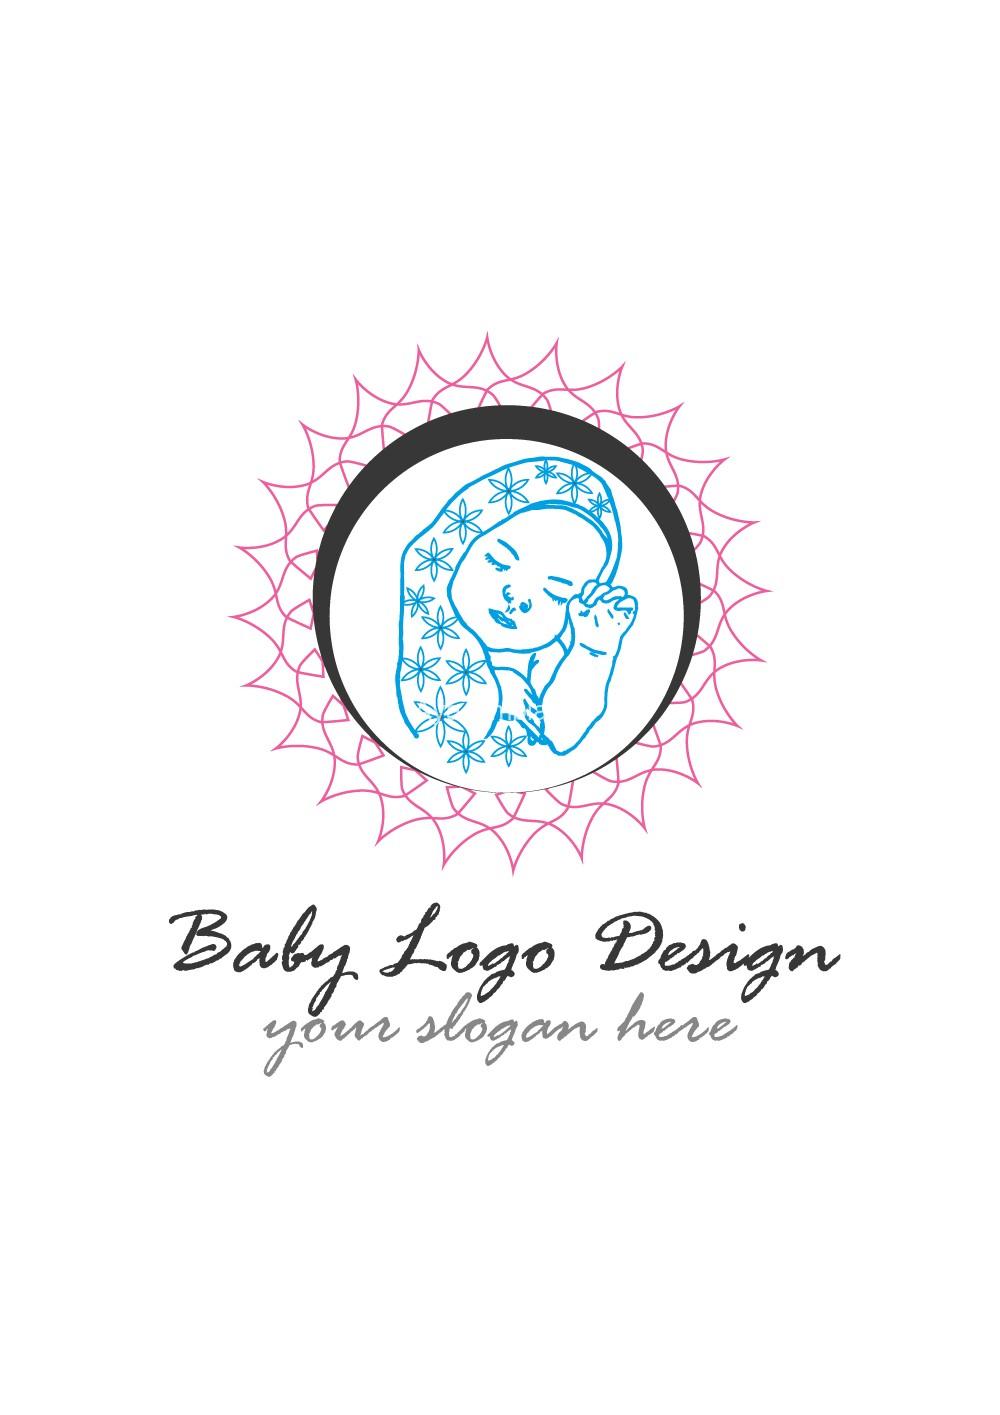 Baby-logo-design